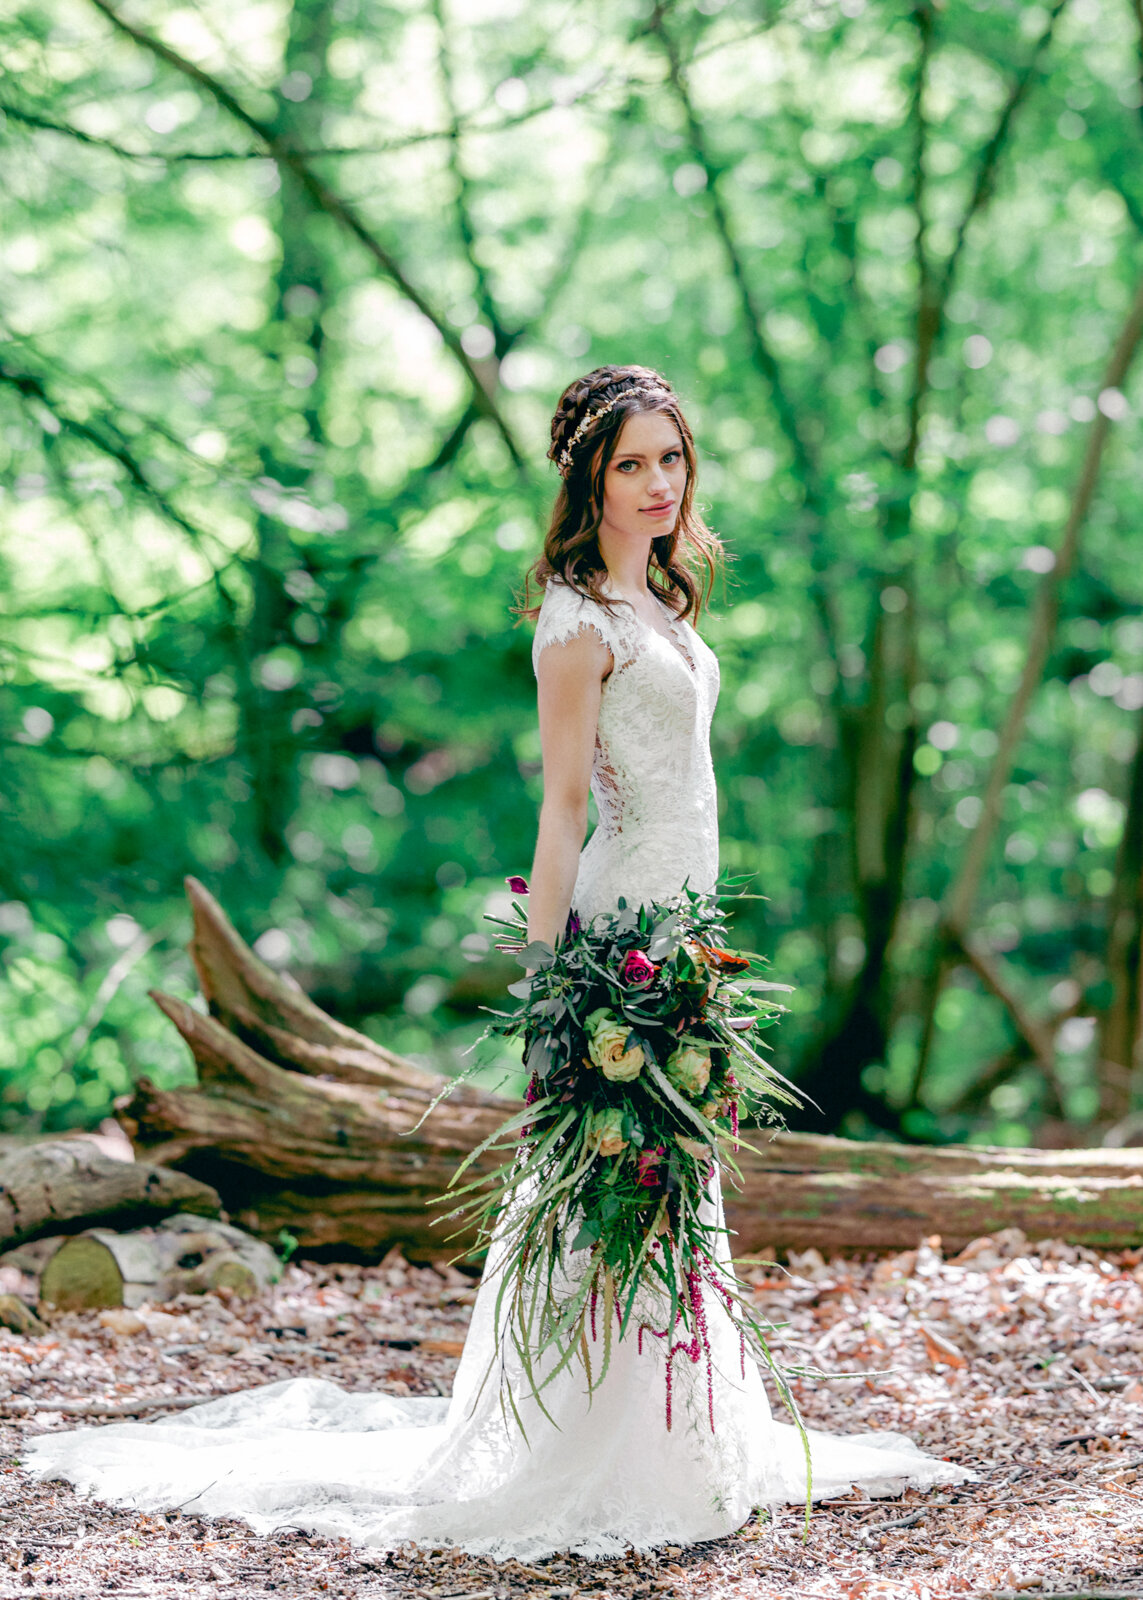 Wedding Dresses - https://www.bridesdogood.com